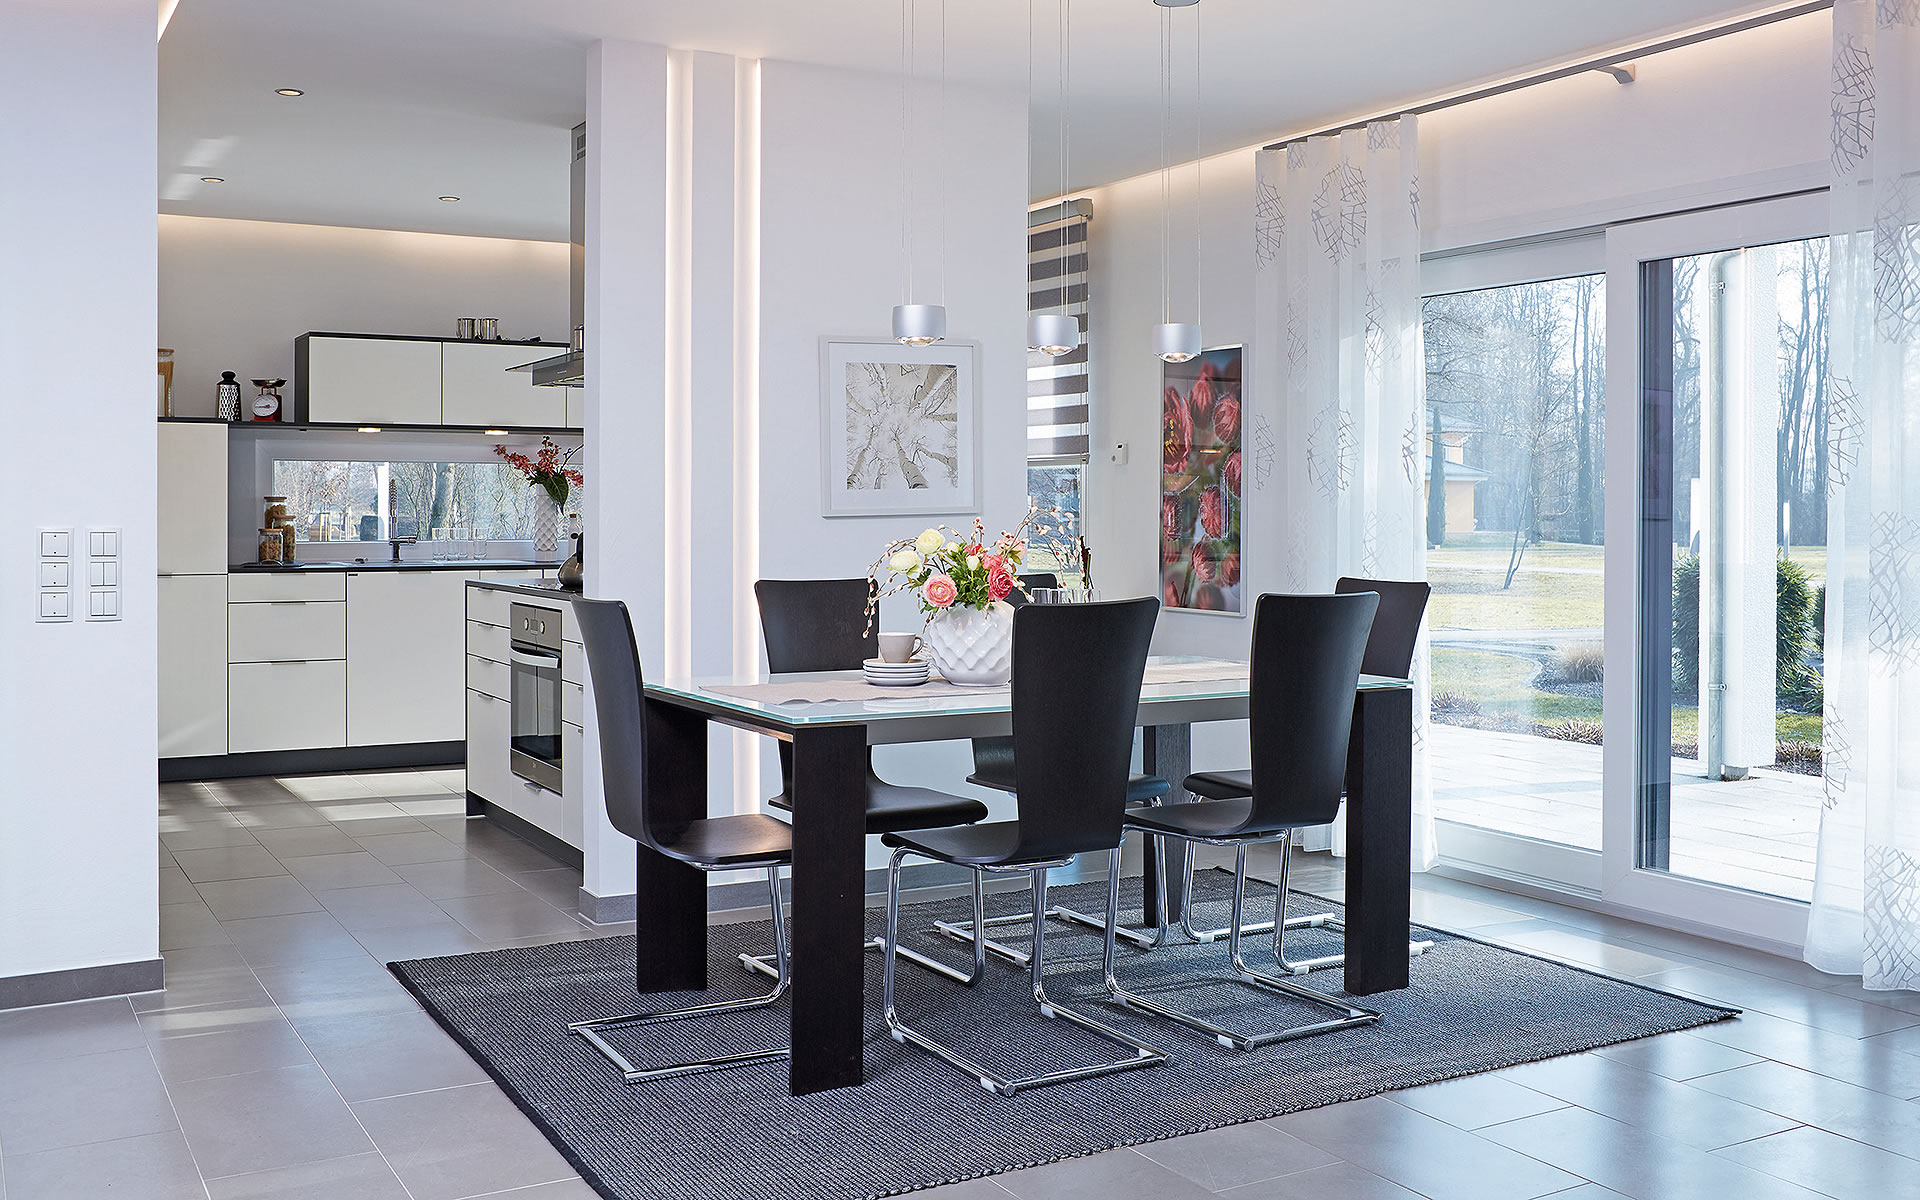 Musterhaus Rheinau-Linx (generation 5.5) von WeberHaus GmbH & Co. KG